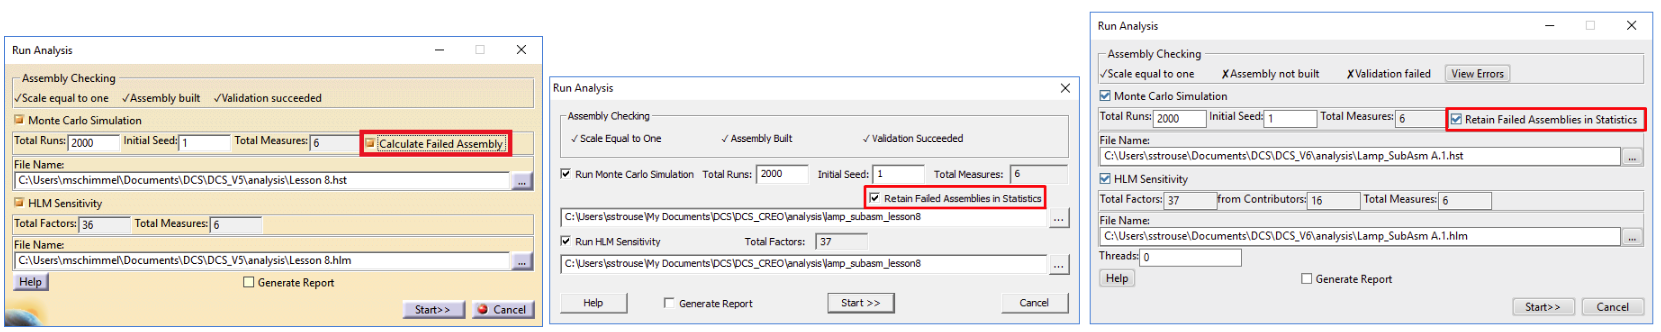 Tips when running analysis -- 3DCS Pattern Move